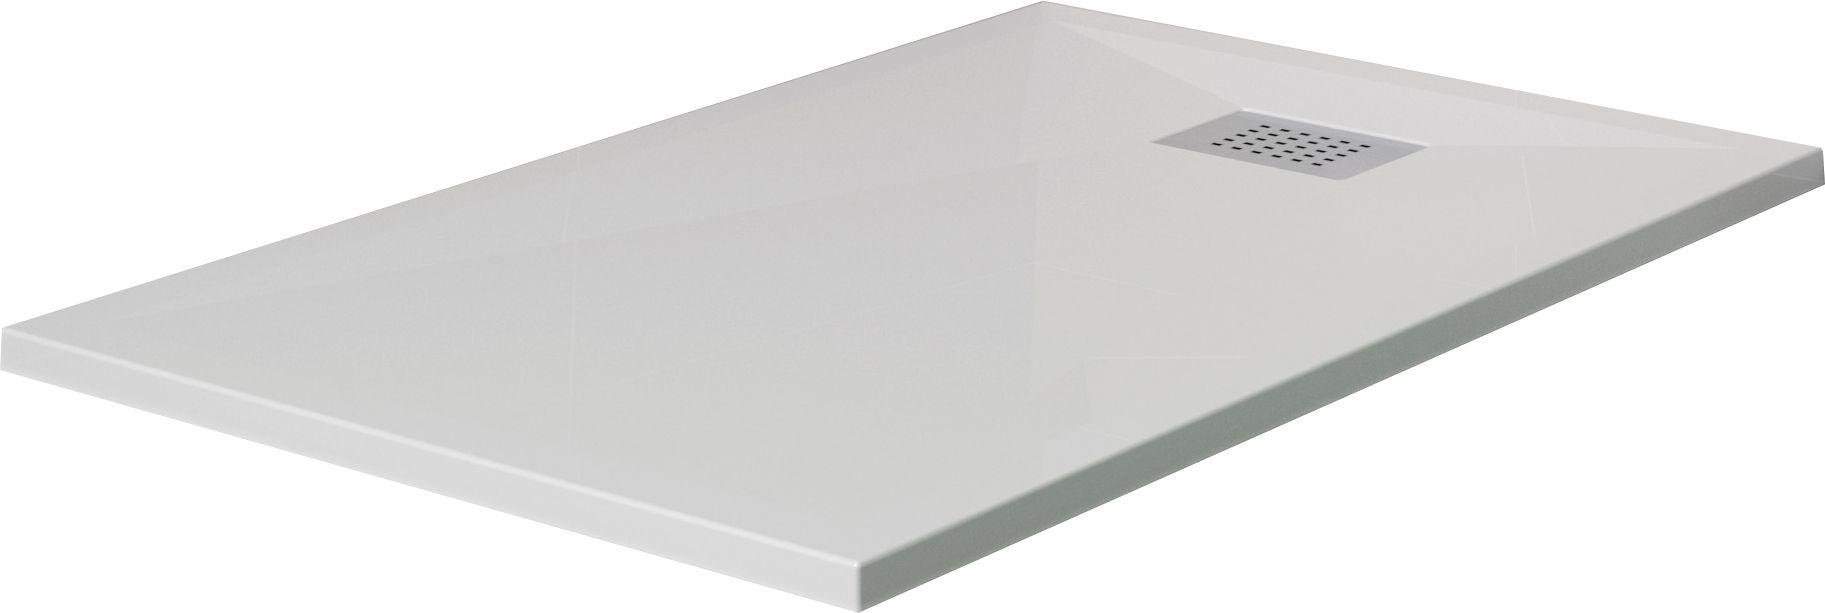 kinedo receveur kinesurf extra plat rectangulaire. Black Bedroom Furniture Sets. Home Design Ideas